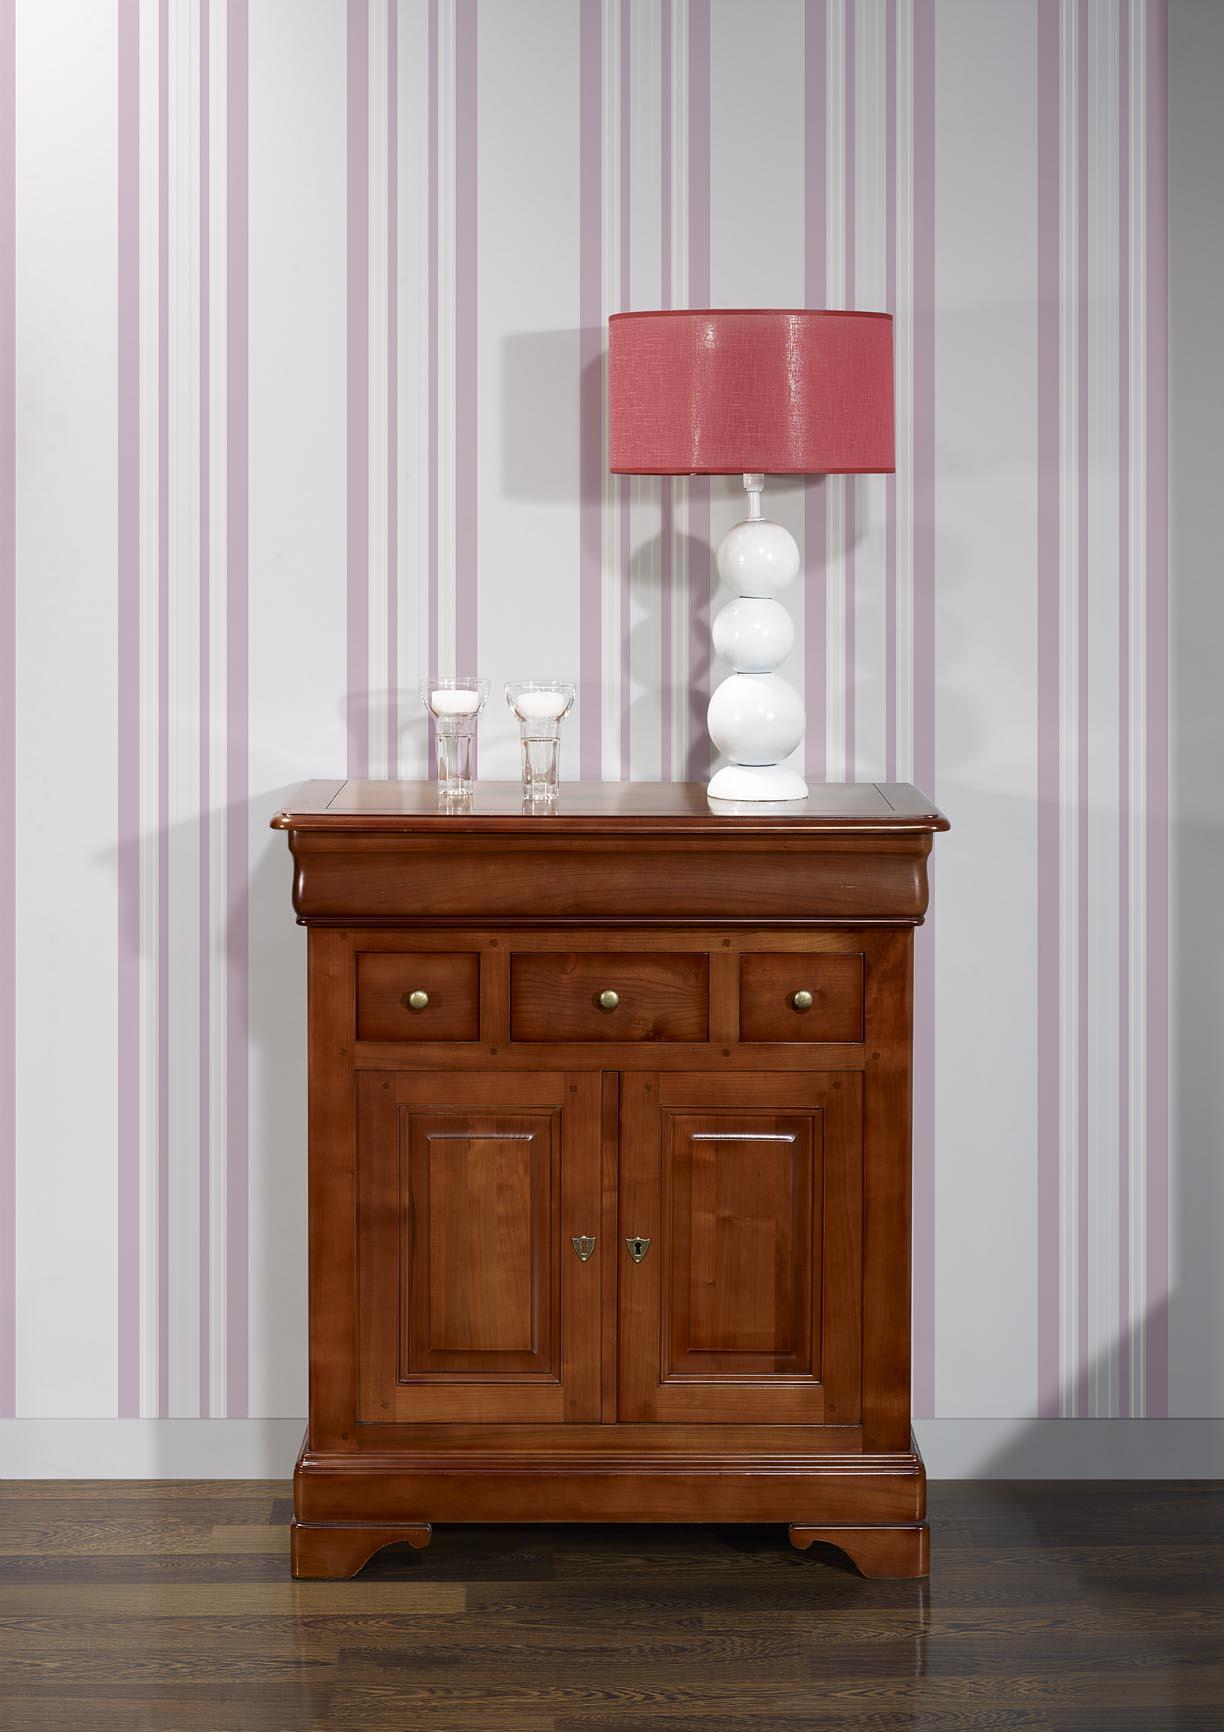 petit buffet maria jos e en merisier massif de style louis philippe meuble en merisier. Black Bedroom Furniture Sets. Home Design Ideas